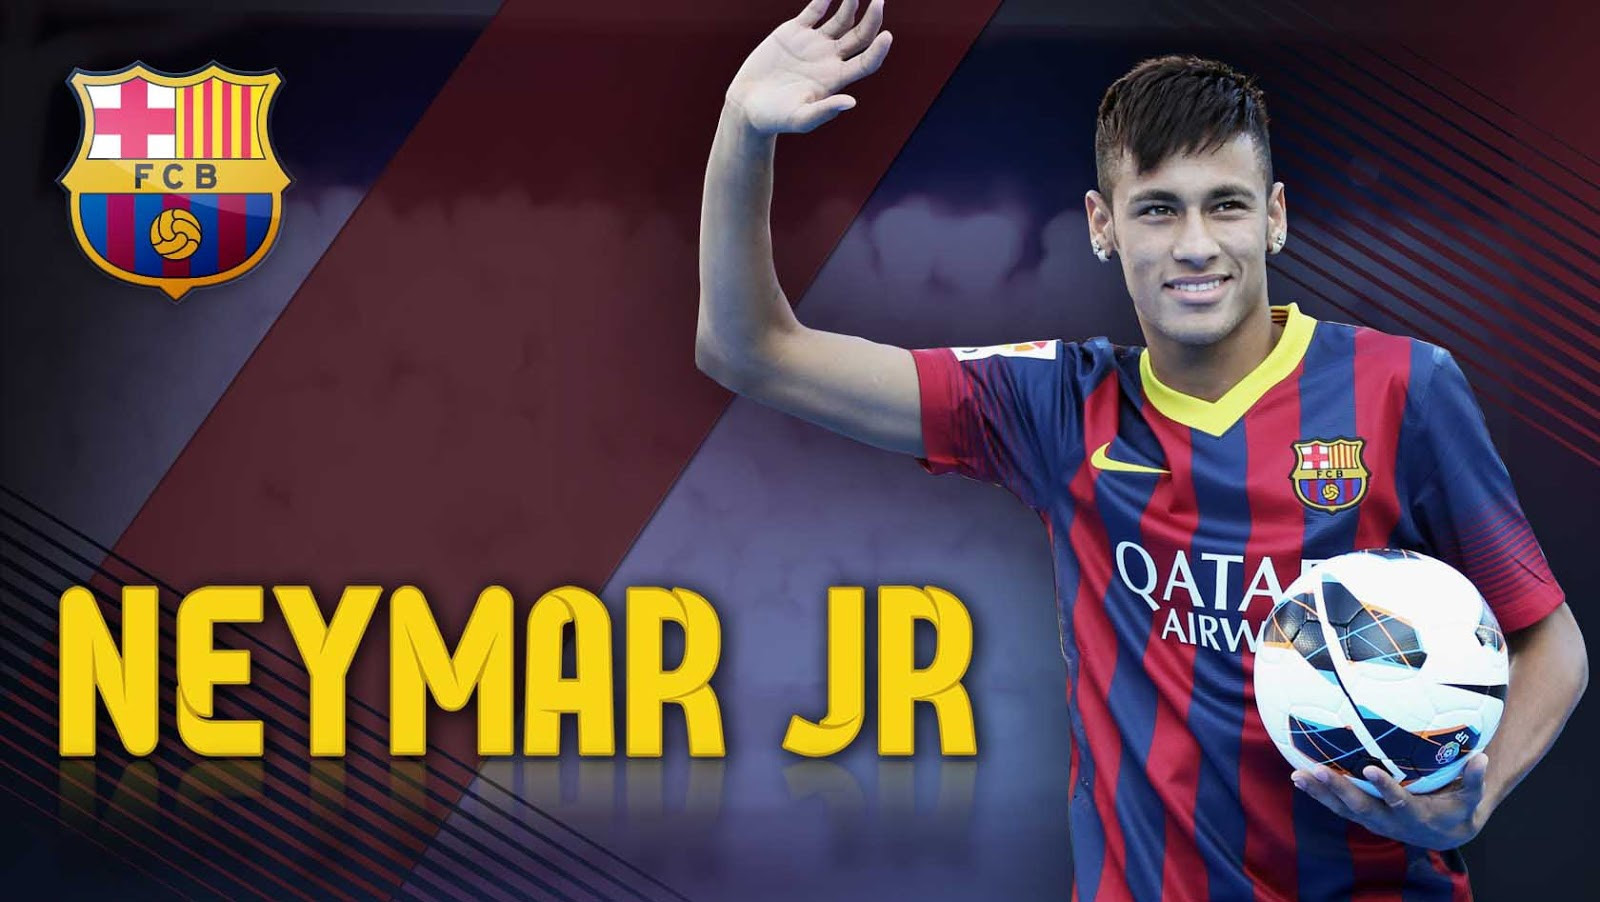 Neymar Wallpapers - Digital HD Photos